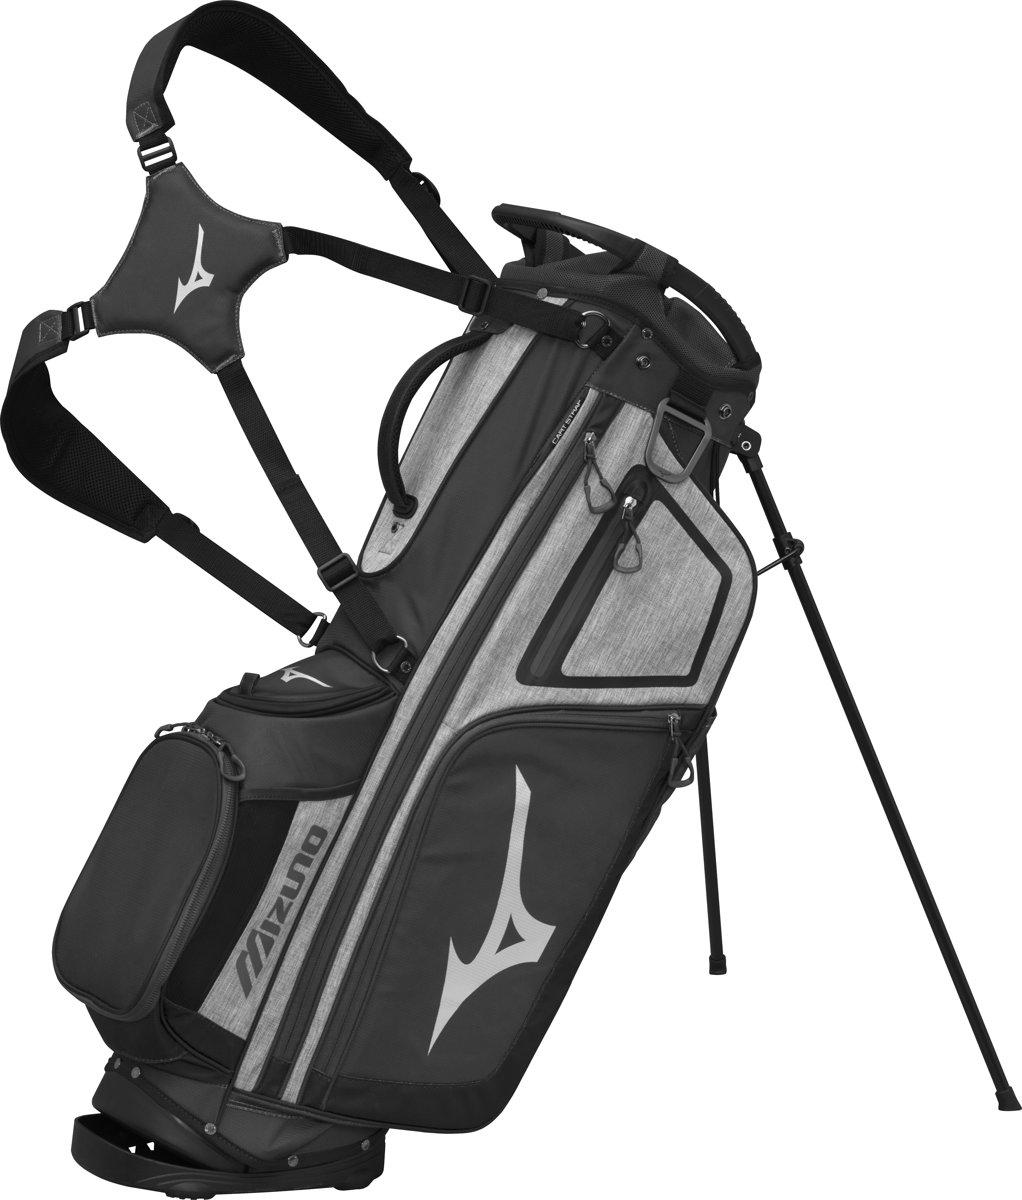 Mizuno golftas - BRD-4 Standbag - grijs/zwart kopen